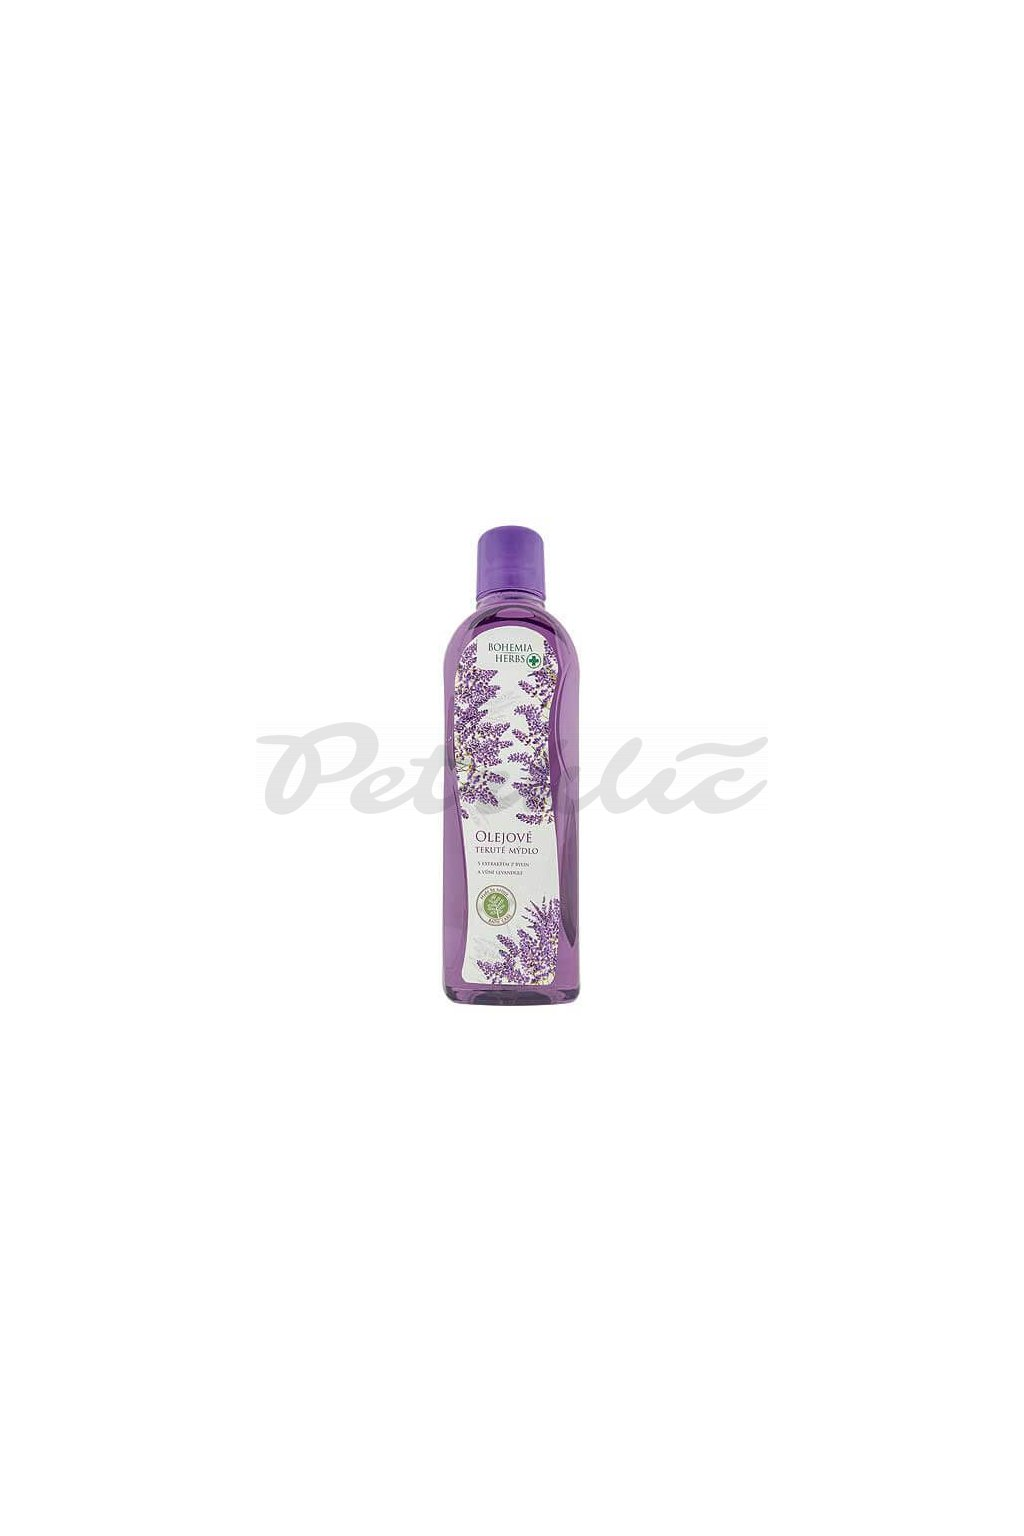 products BC000253 bohemia mydlo napln olej levandule